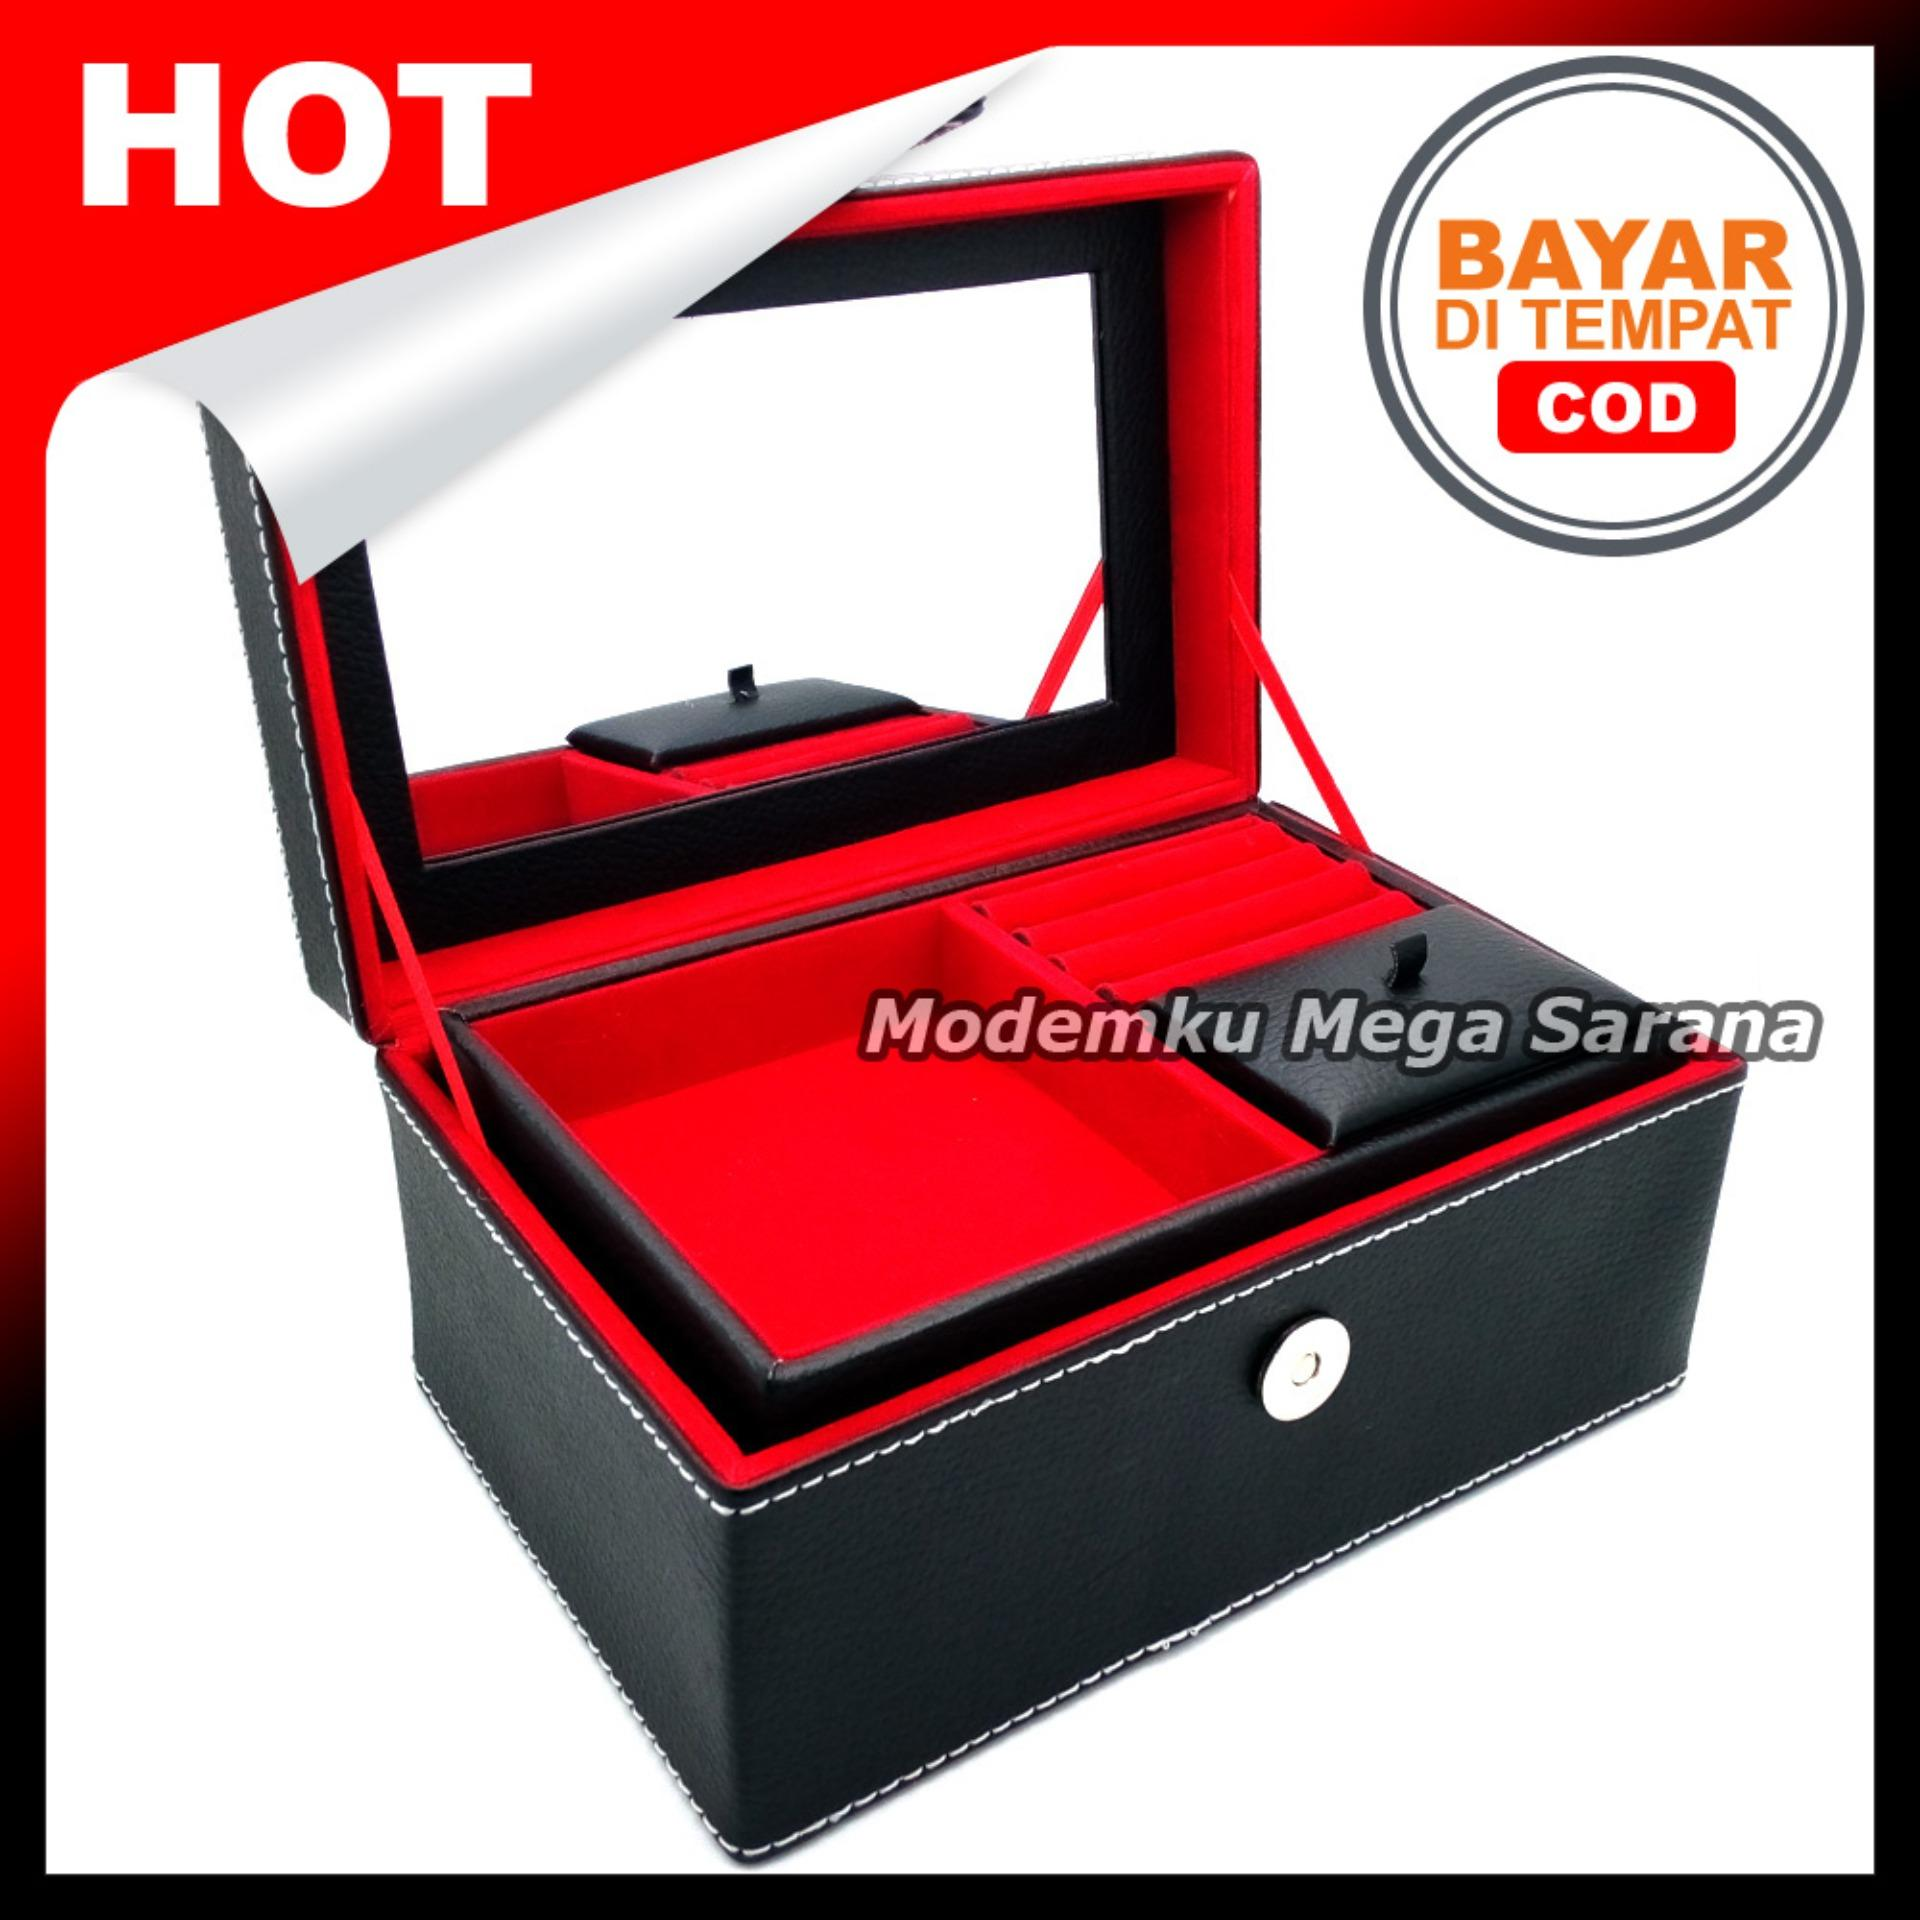 Kotak Box Perhiasan Kalung Gelang Cincin & Aksesoris 21x14x11 cm - Hitam dlm Merah